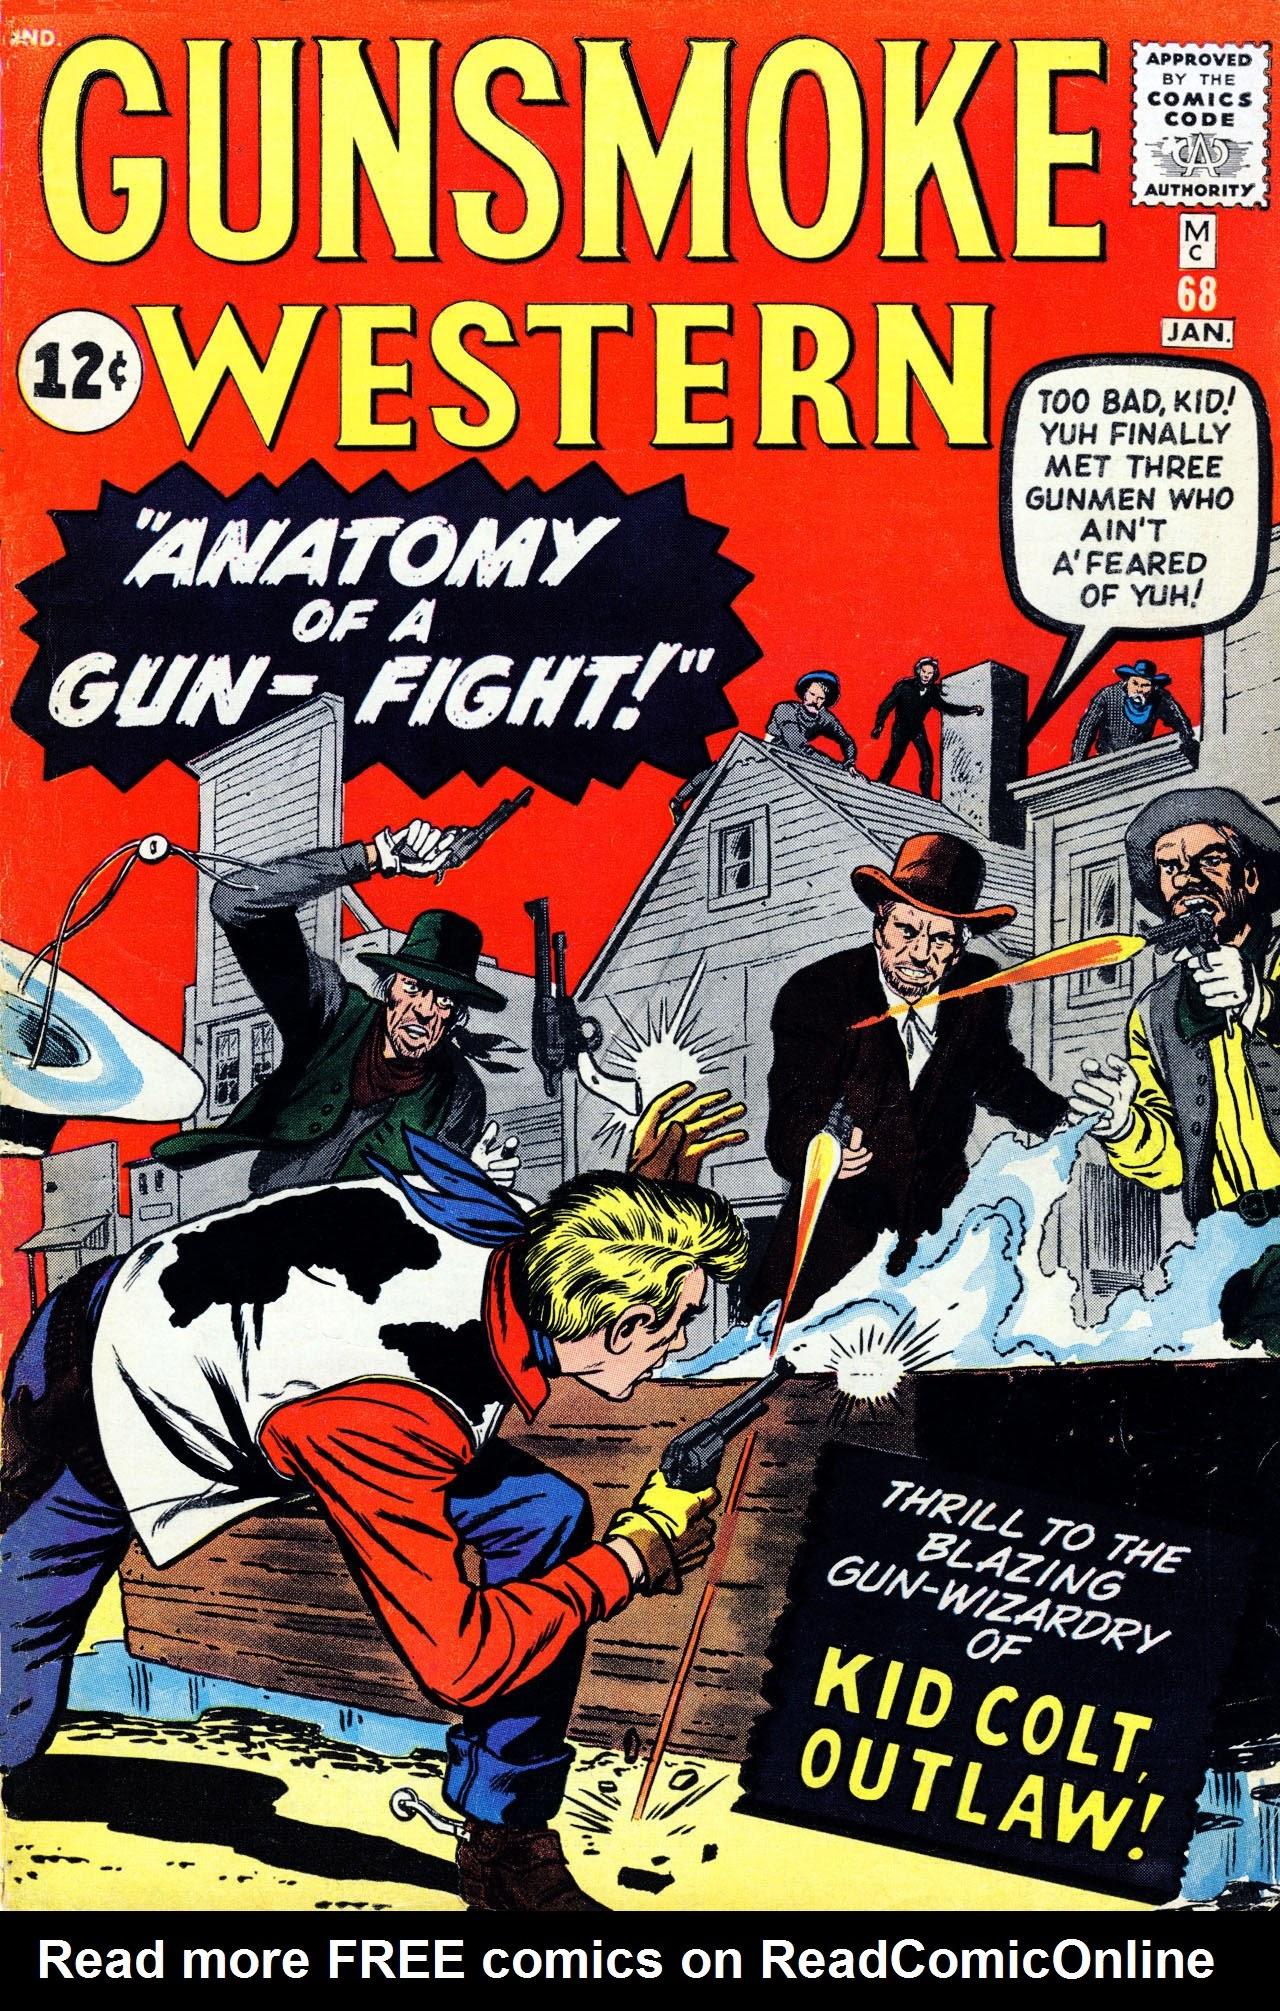 Gunsmoke Western 68 Page 1